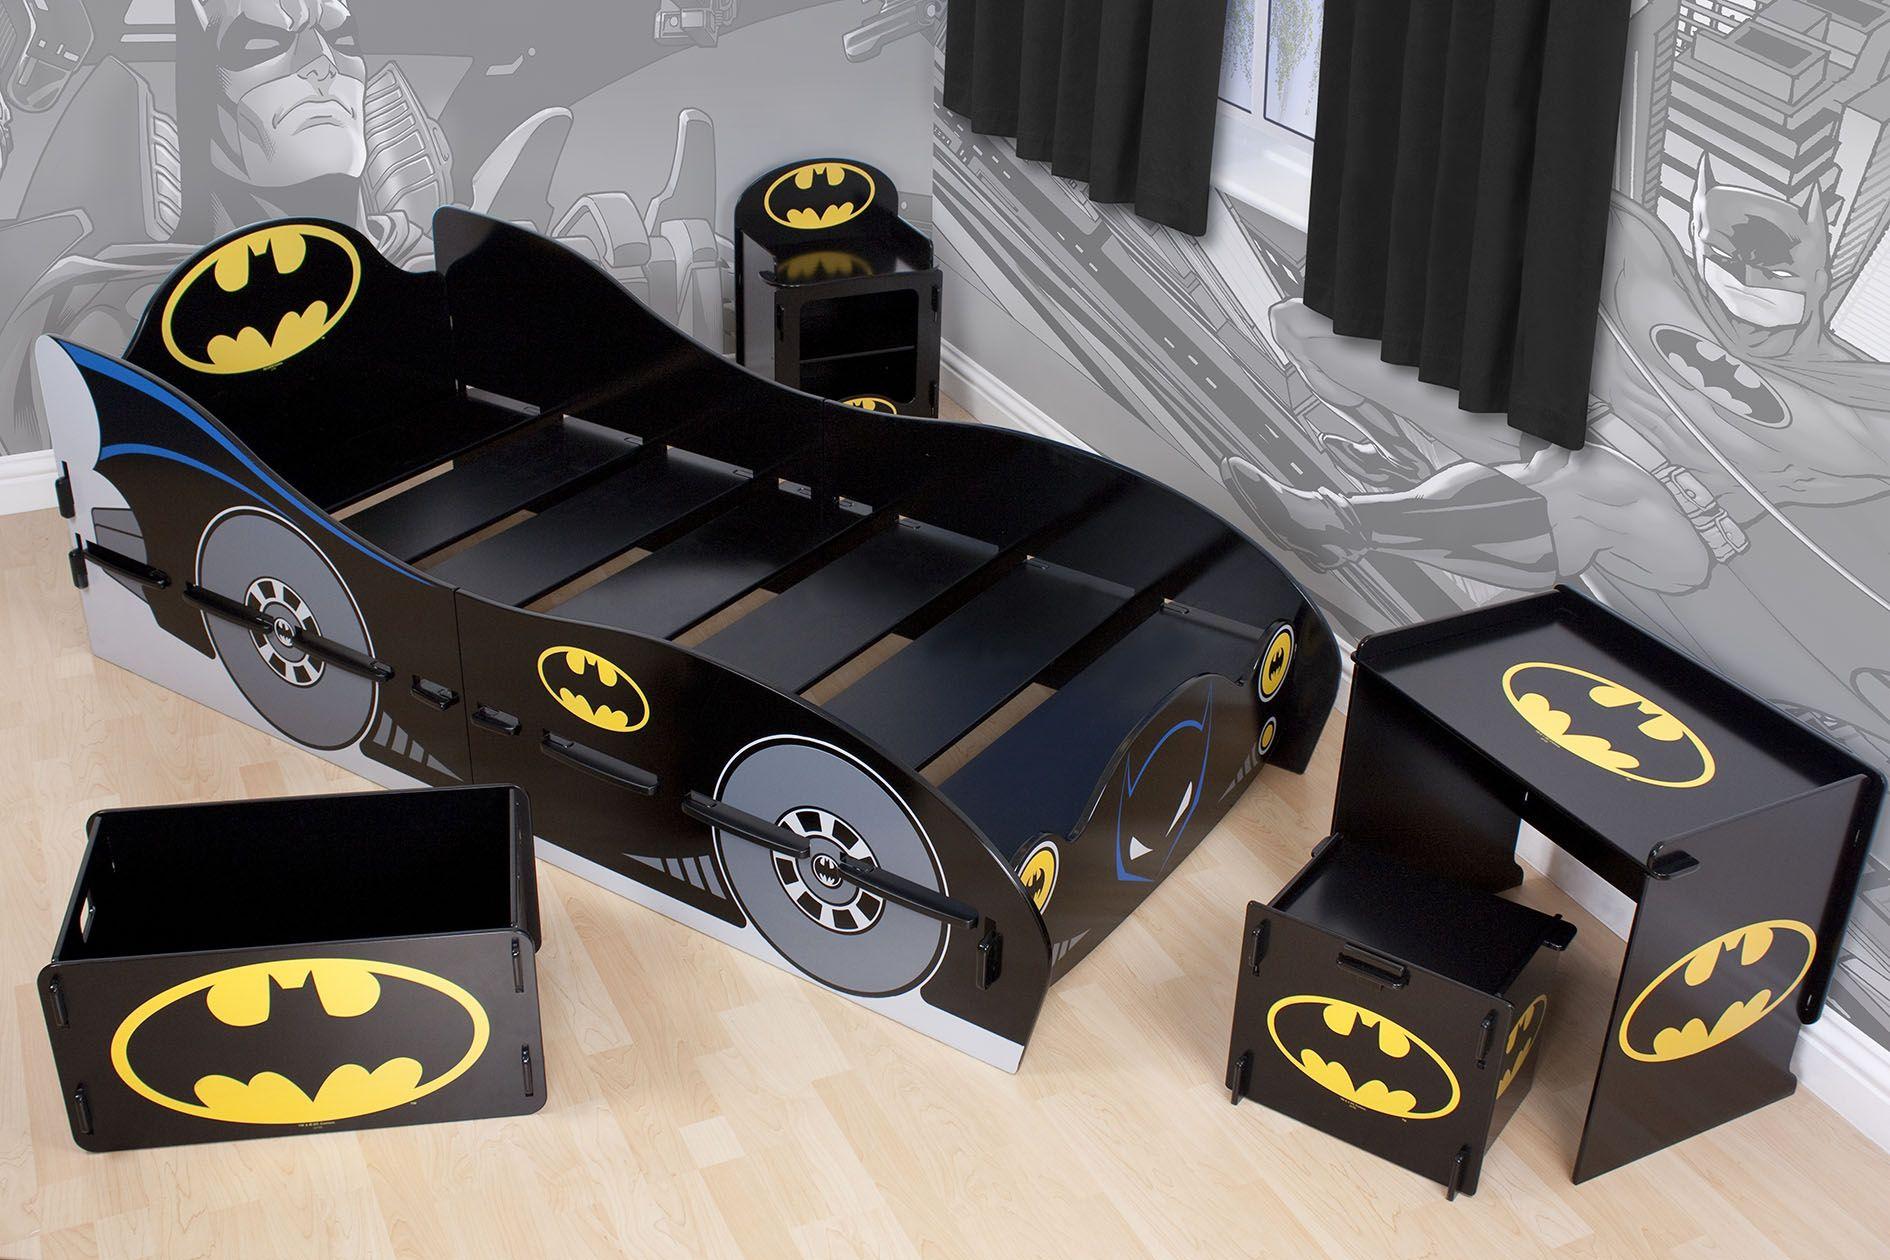 Batman Kidsaw Furniture Range: Batman Kidsaw Bed (RRP £250 ...